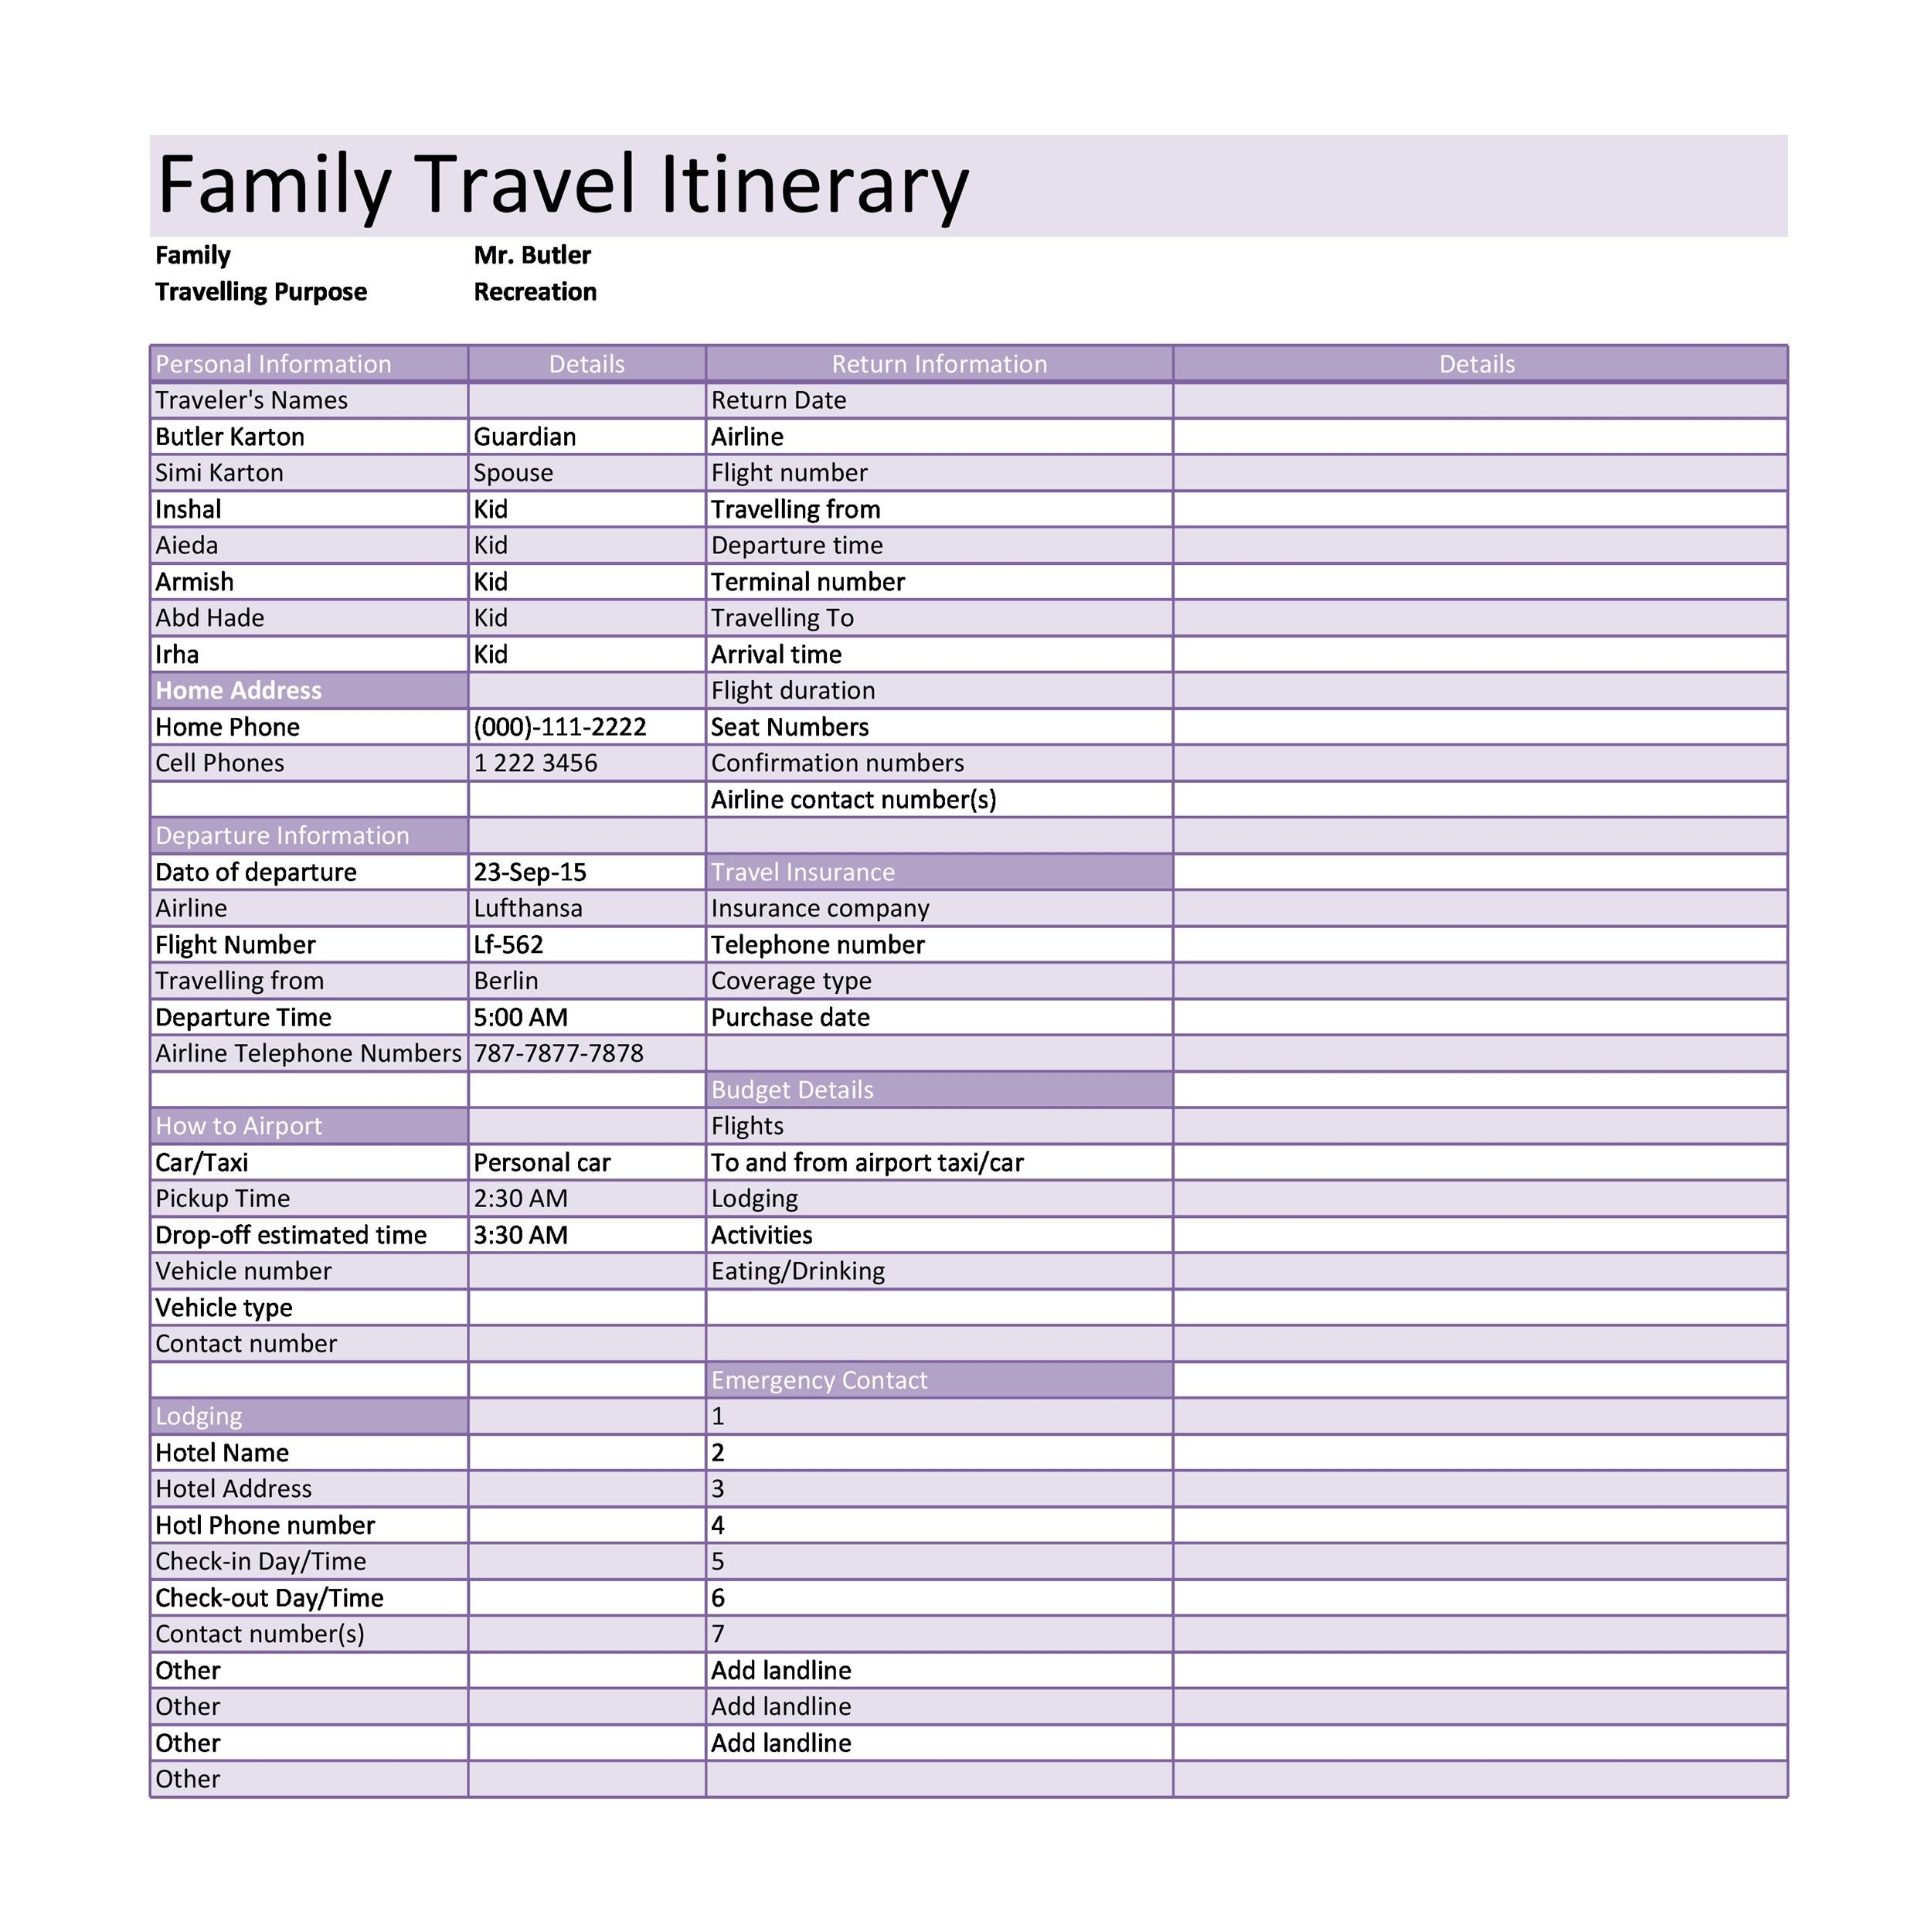 30+ Itinerary Templates (Travel, Vacation, Trip, Flight)